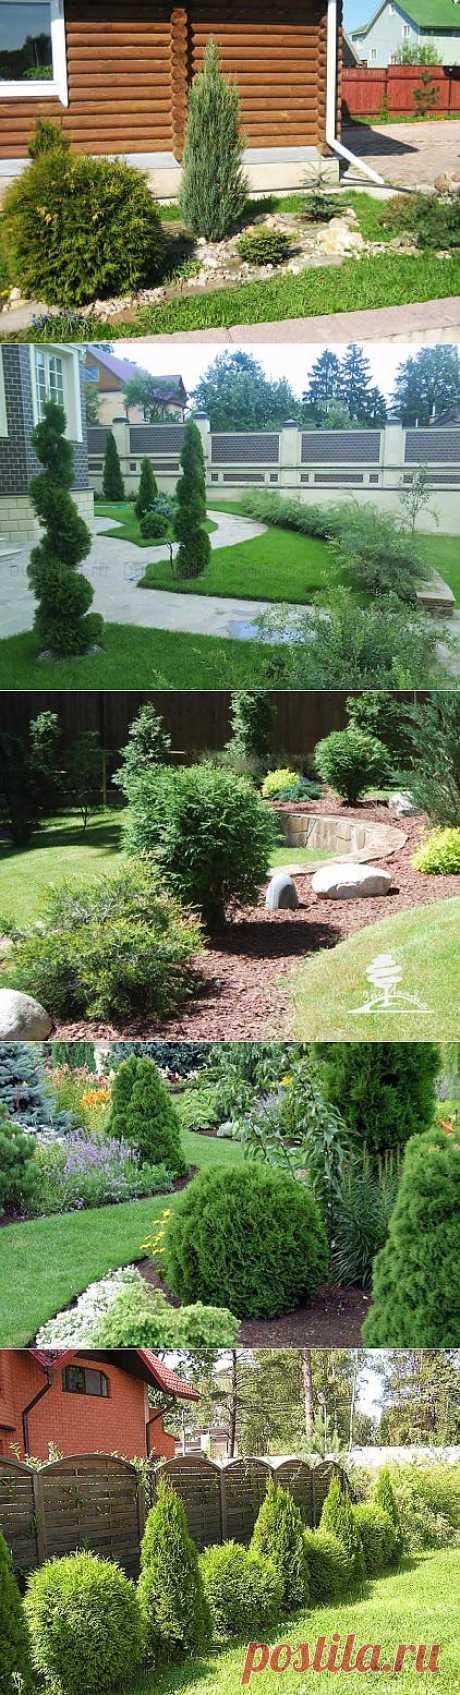 Home garden|Сад, огород, растения дома